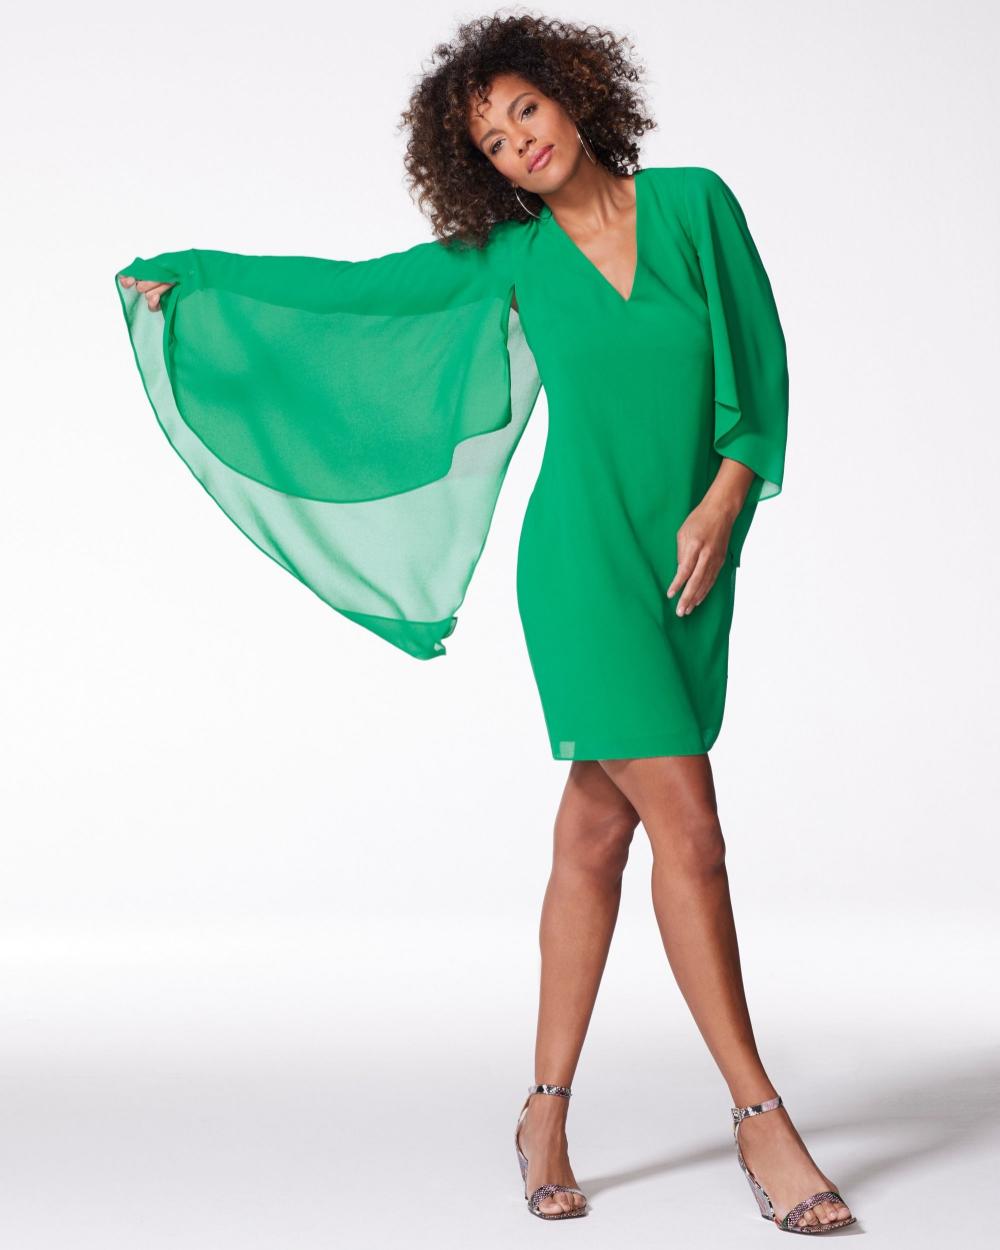 Vince Camuto Cape Effect Shift Green Fashion Apparel Trending [ 1250 x 1000 Pixel ]